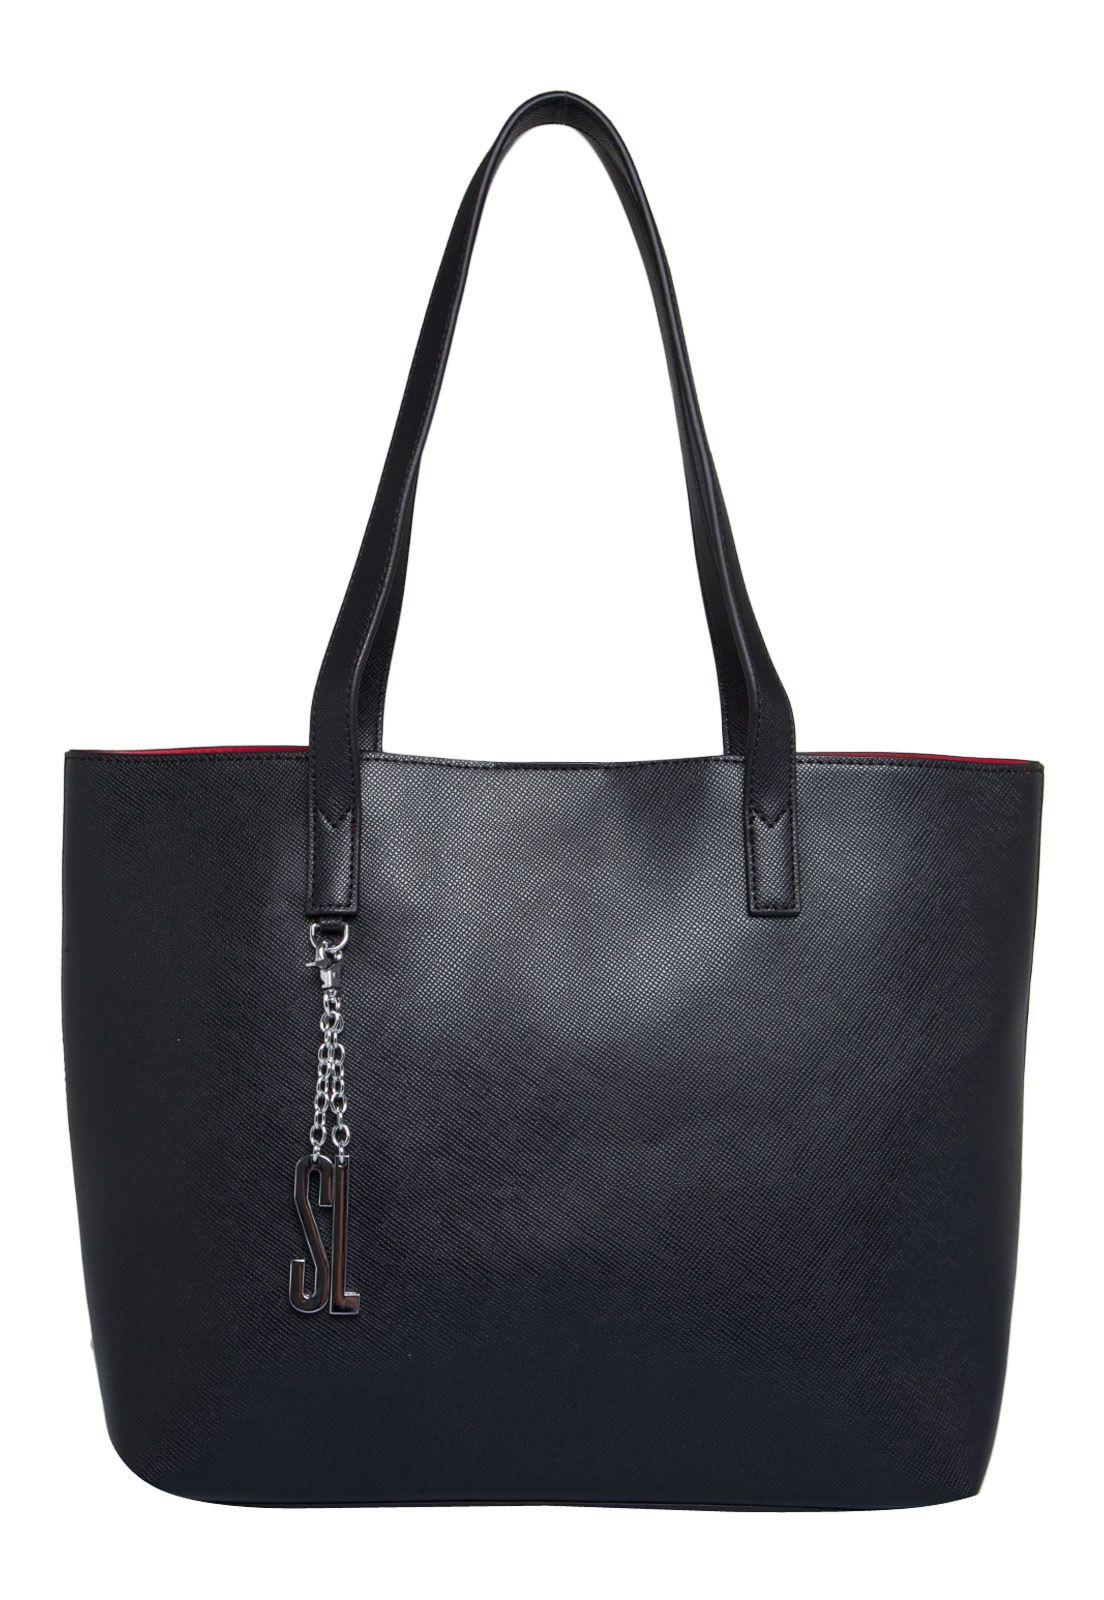 ab2f5765b Bolsa Santa Lolla Sacola Preta - Marca Santa Lolla | Fashion ...